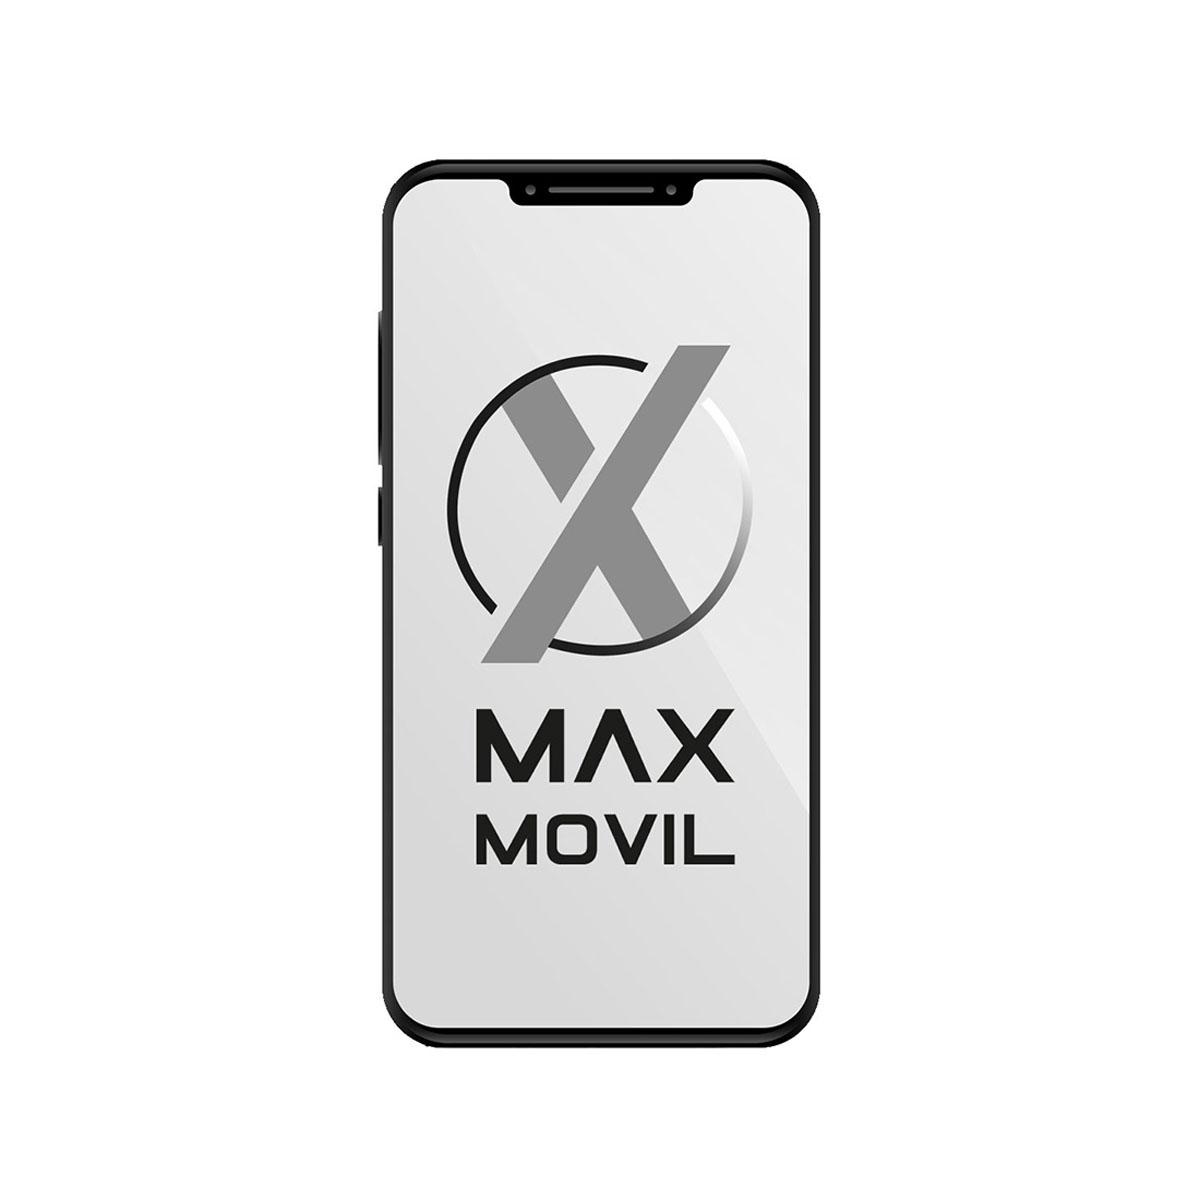 Cargador USB LG MCS-04ER + Cable microUSB EAD62329704 Blanco